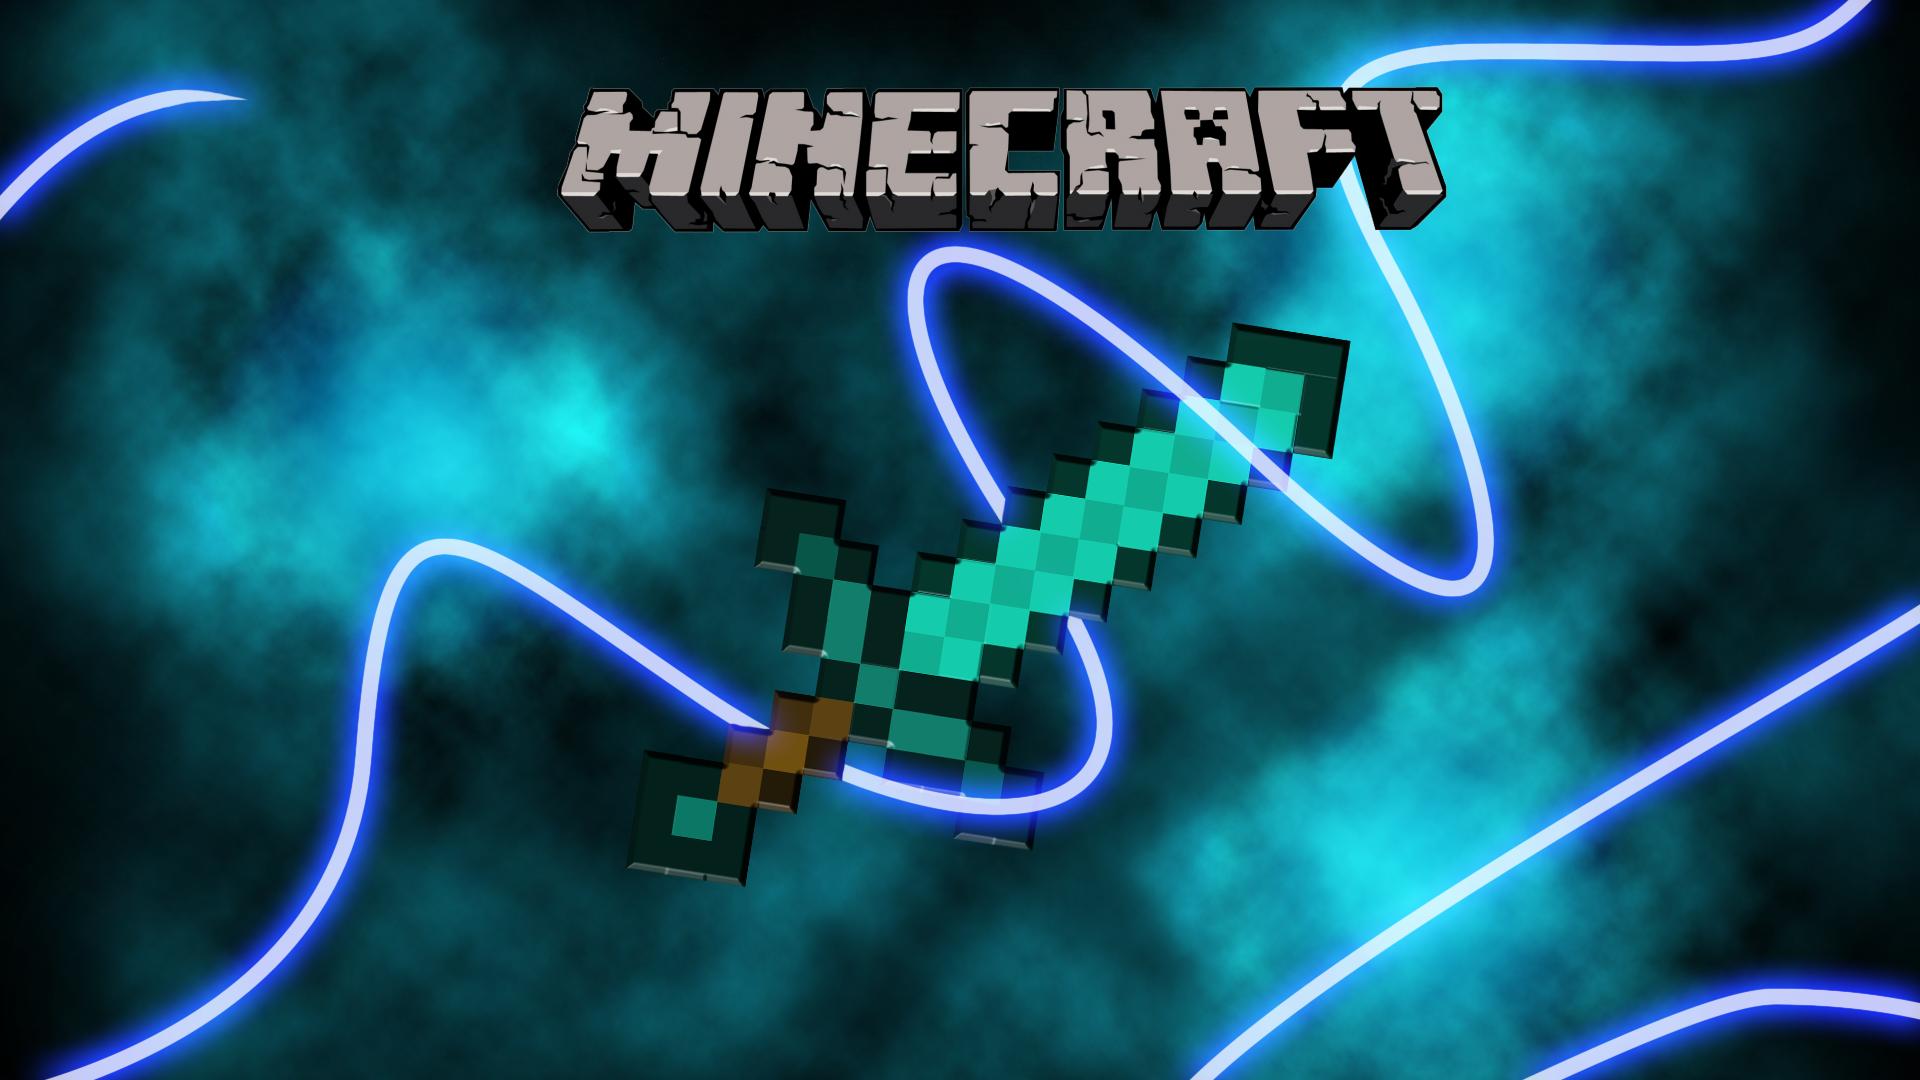 Minecraft Sword Diamond Fond Ecran Minecraft Image De Fond Minecraft